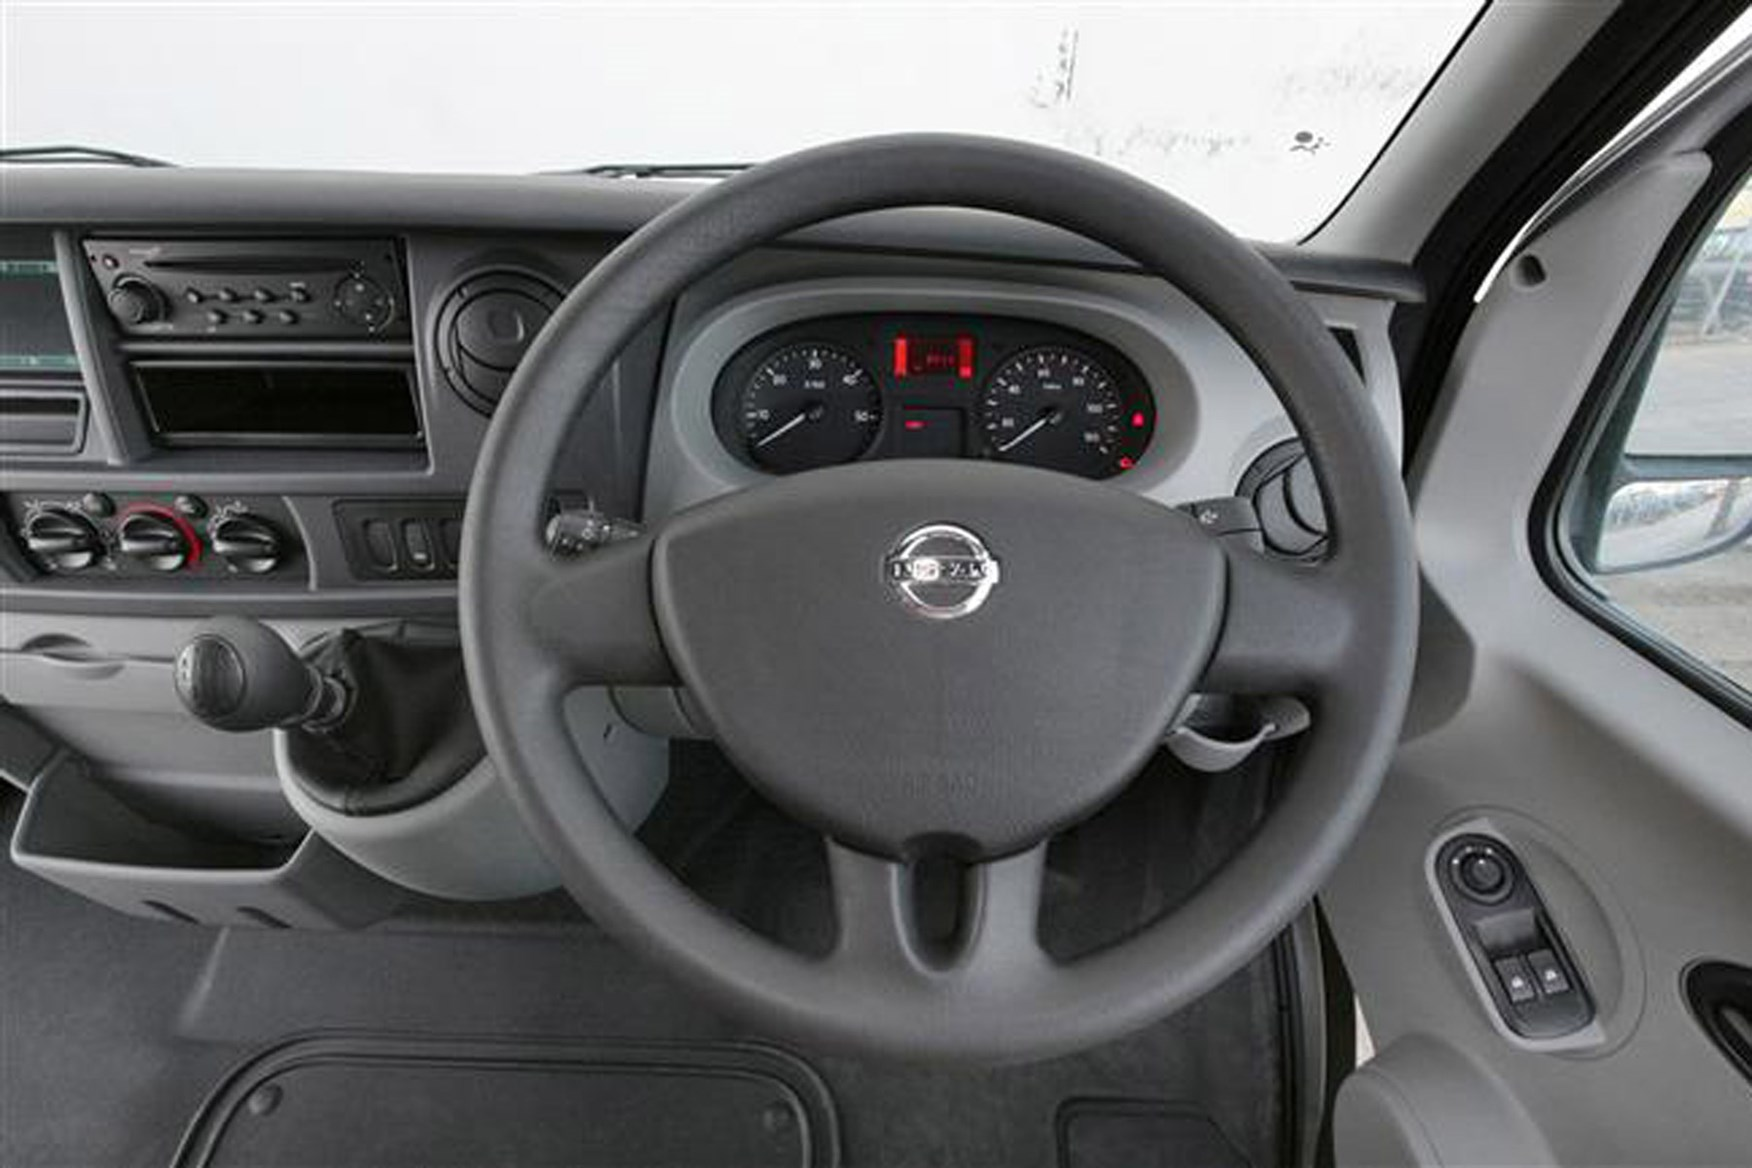 Nissan Interstar 2003-2011 review on Parkers Vans - cabin detail